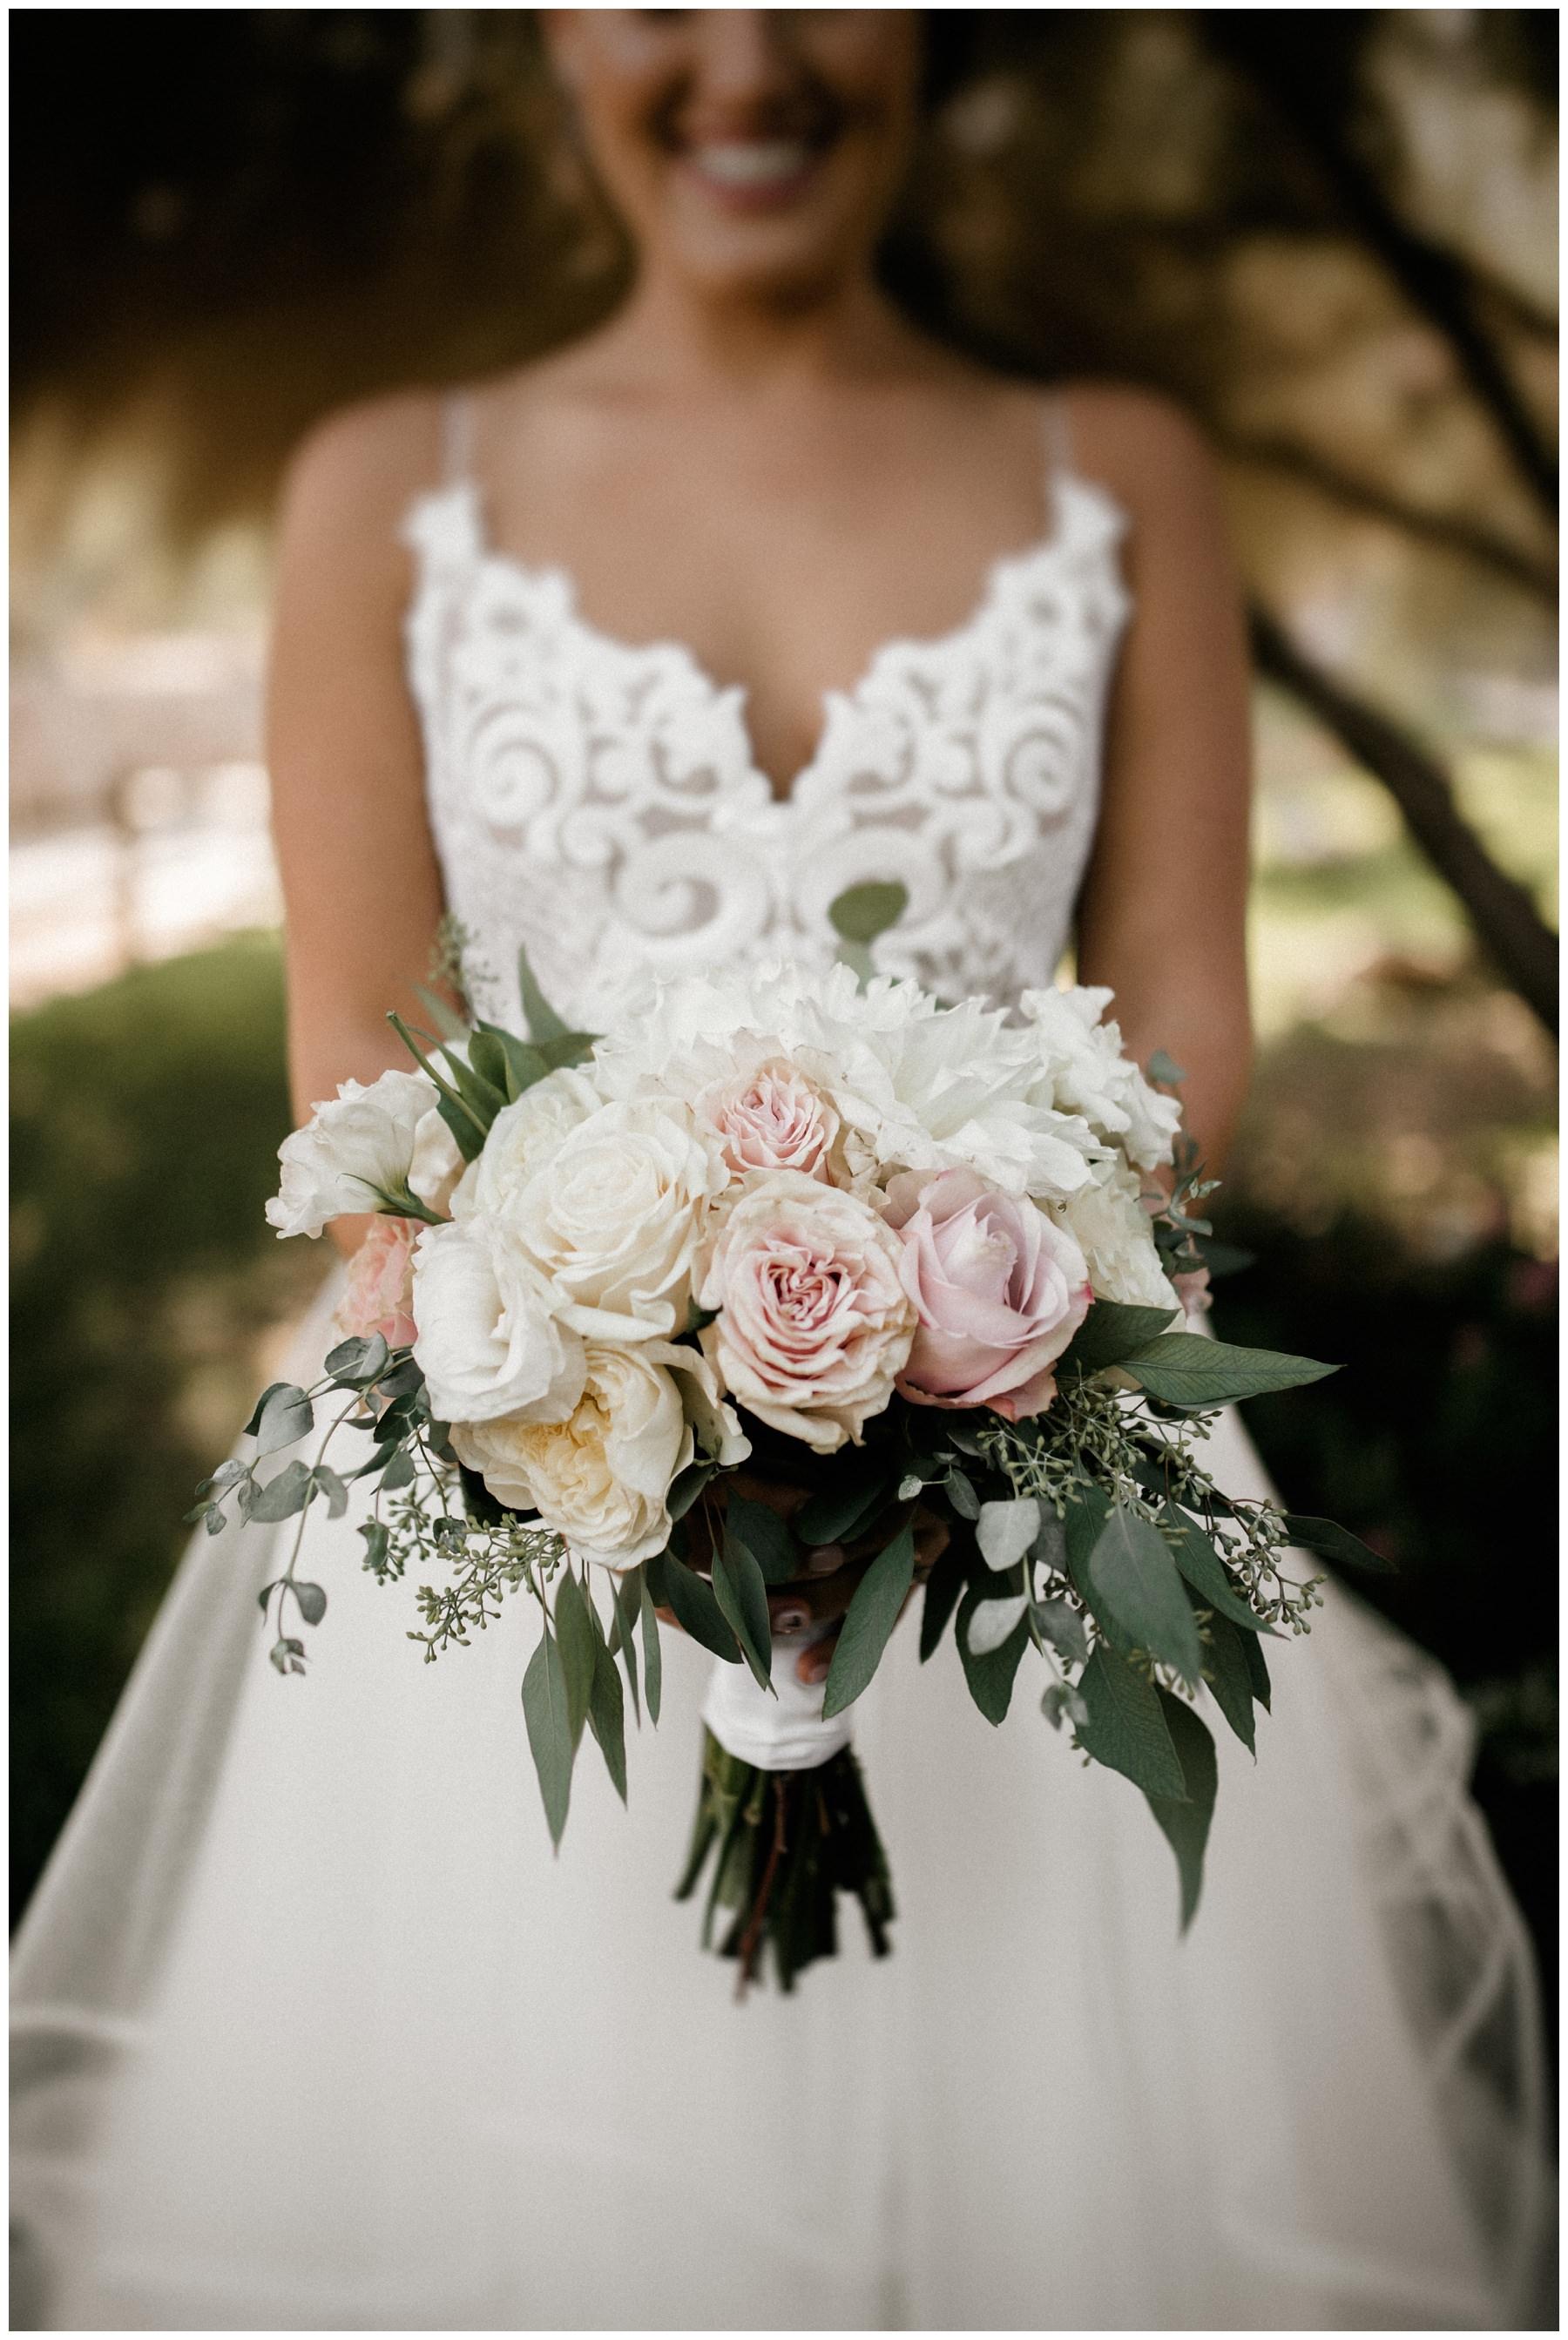 Lake_Oak_Meadows_Wedding_0020.jpg